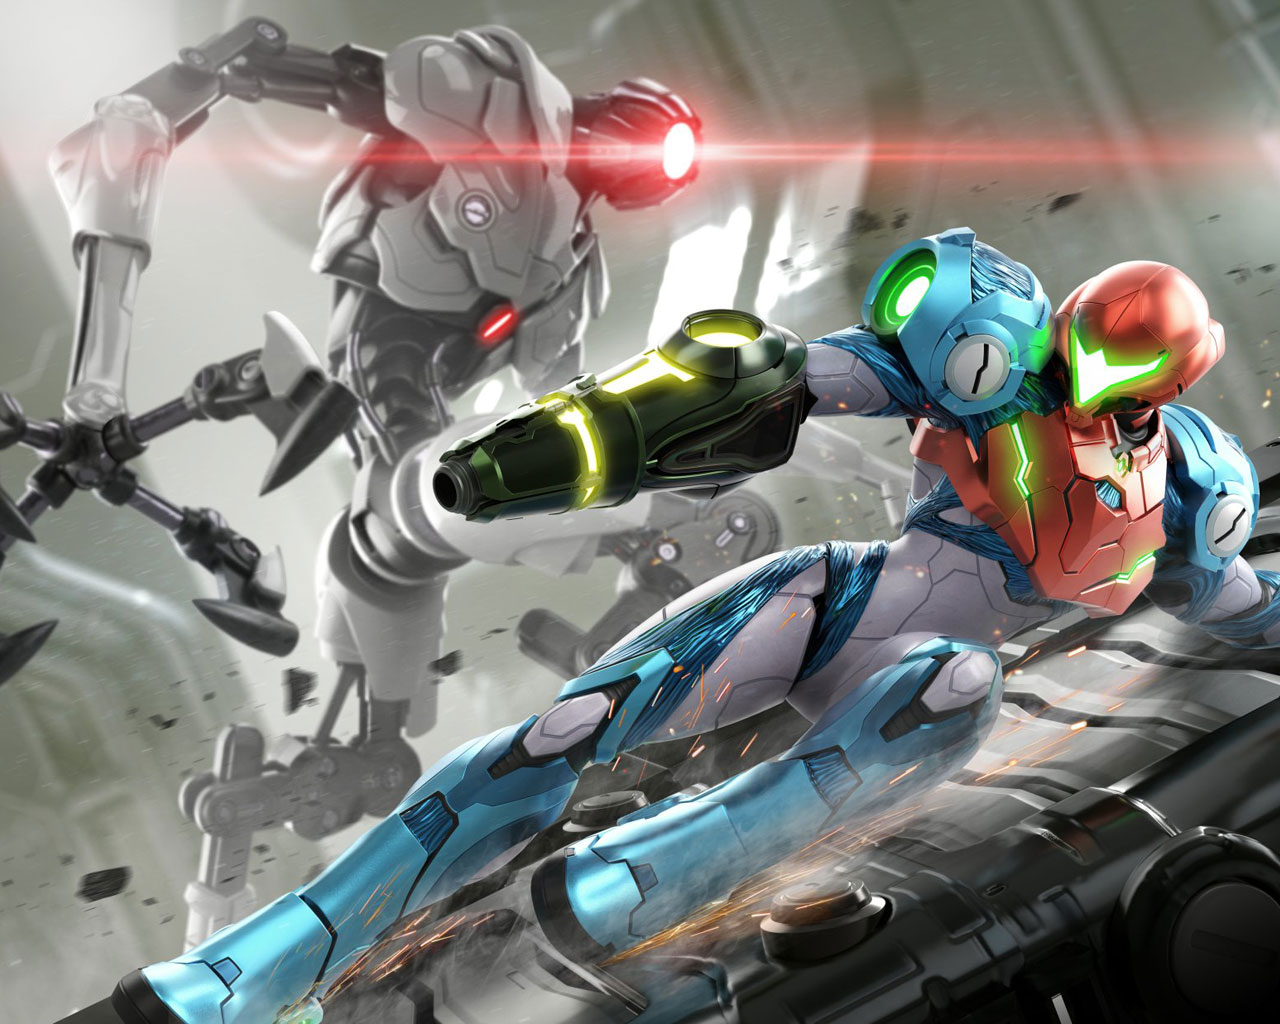 Free Metroid Dread Wallpaper in 1280x1024